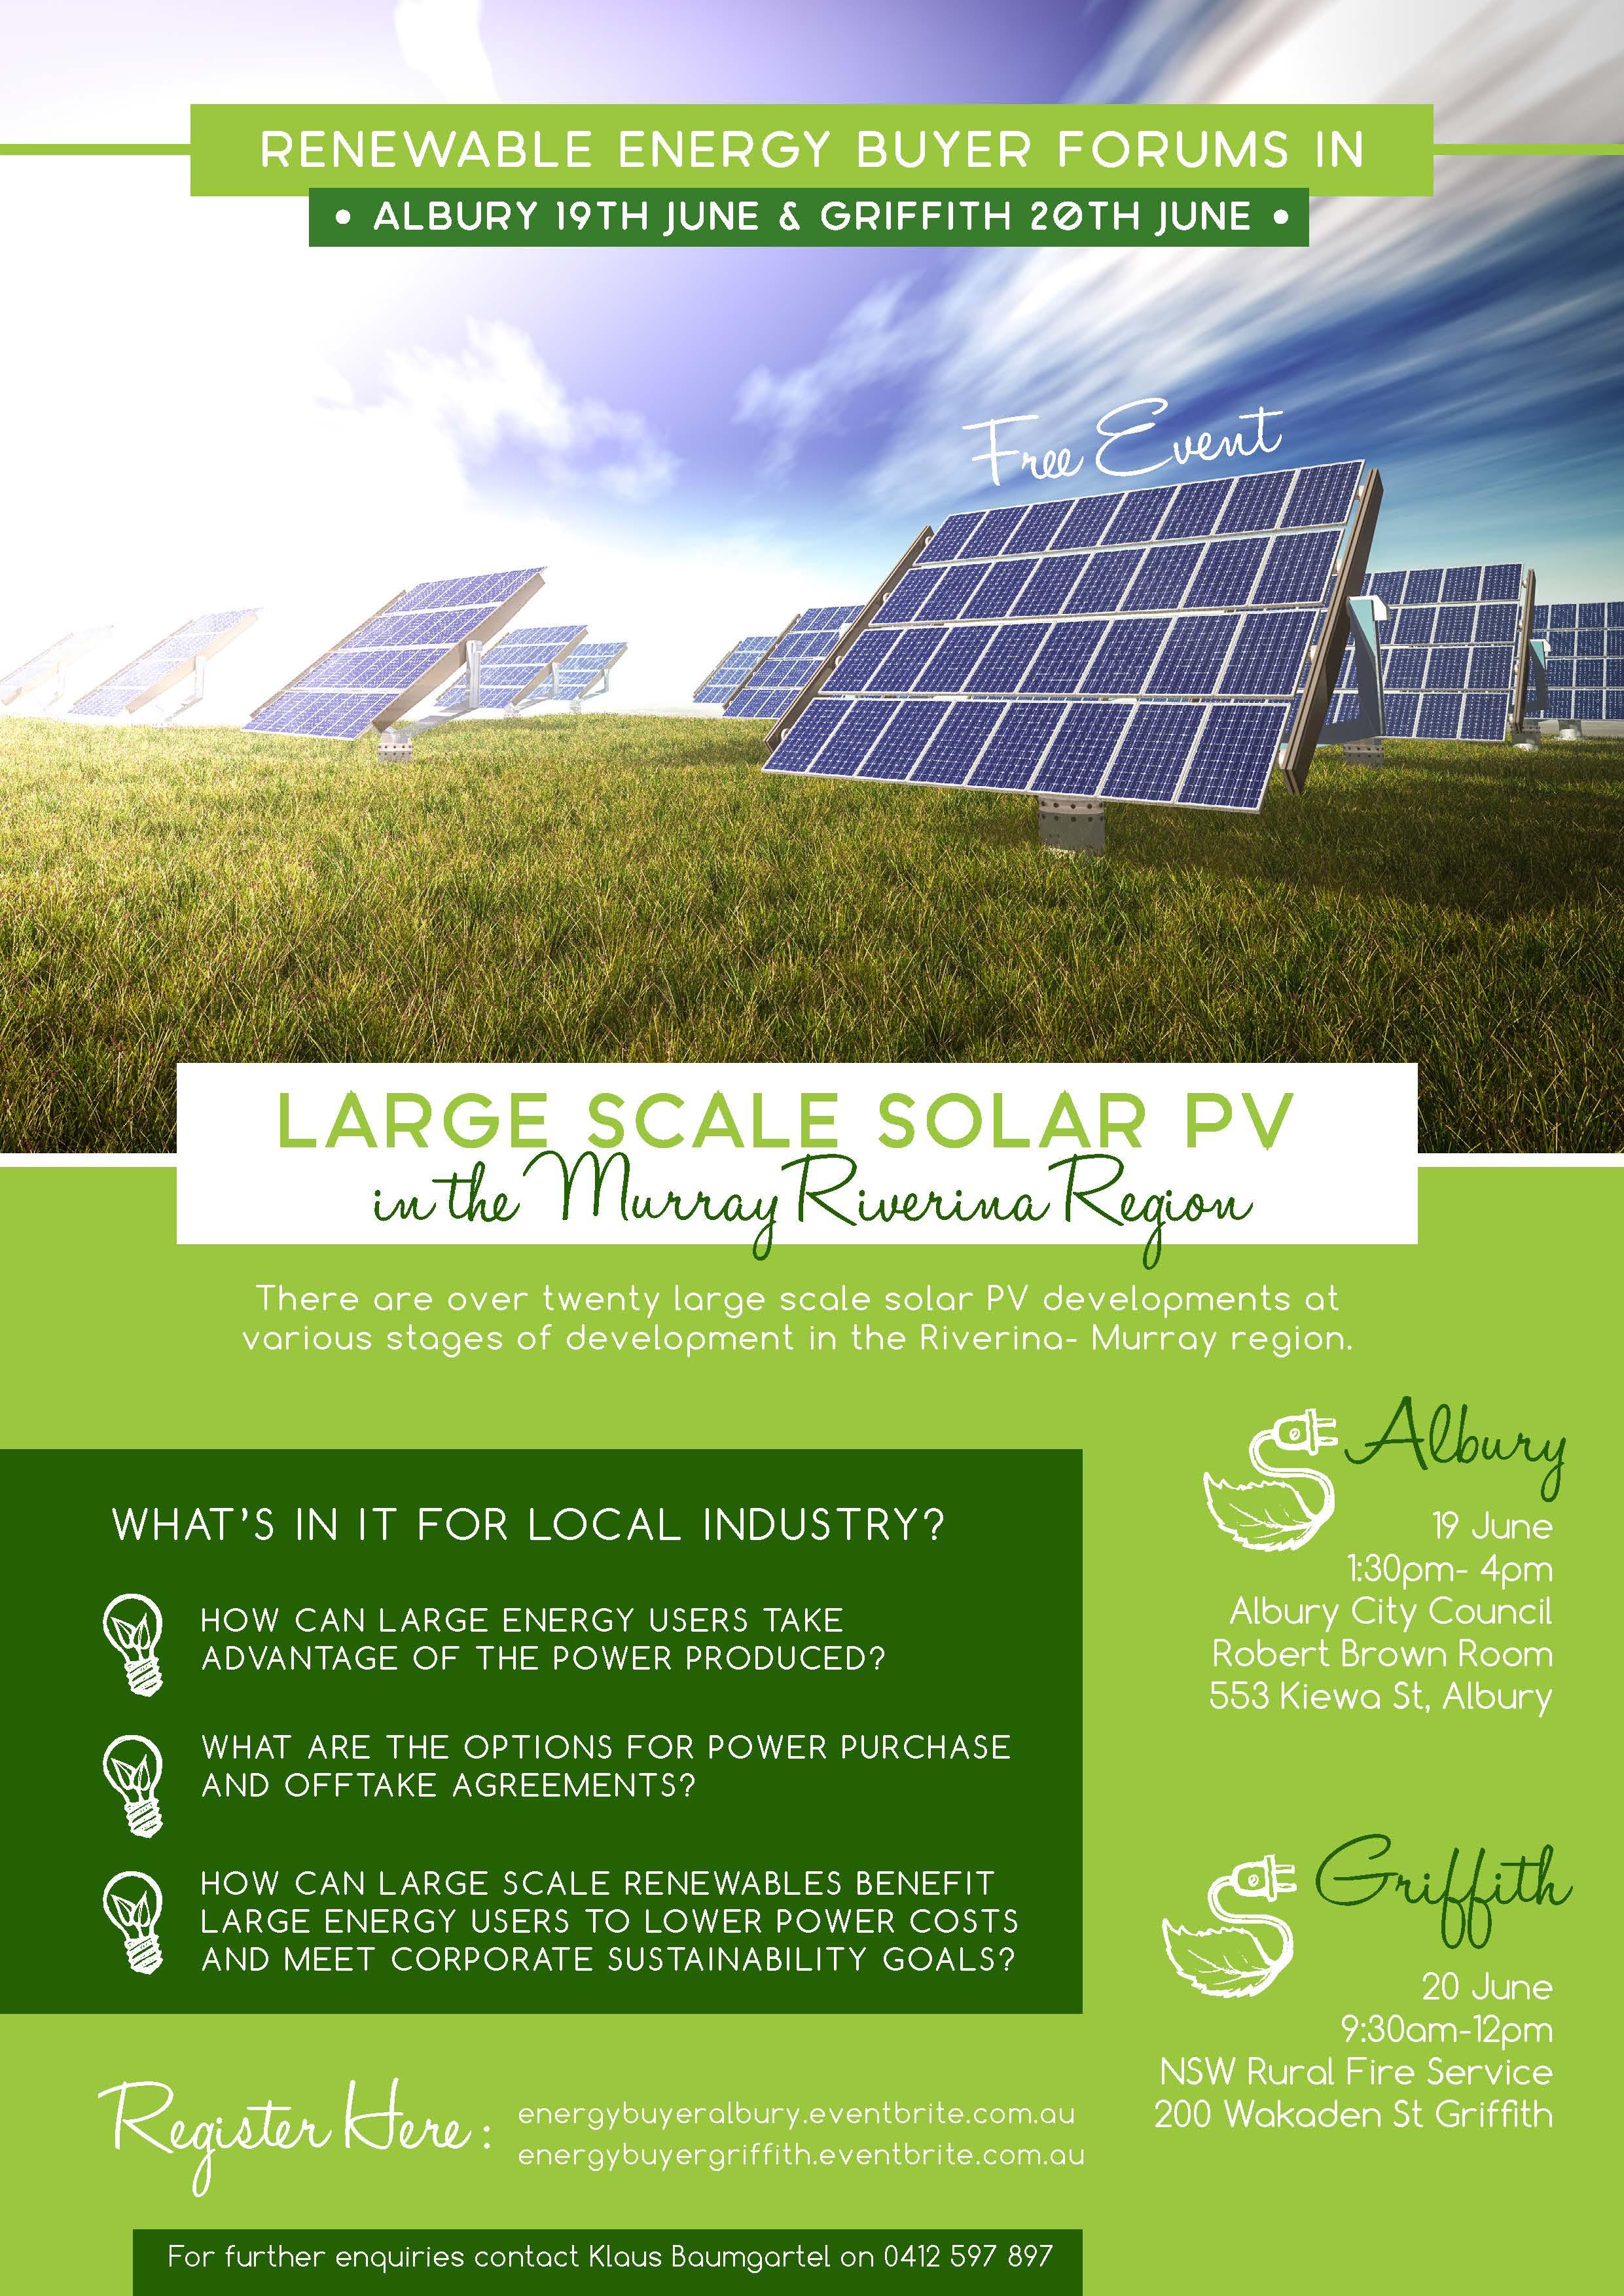 Energy Forum Flyer - 2018_Page_1.jpg